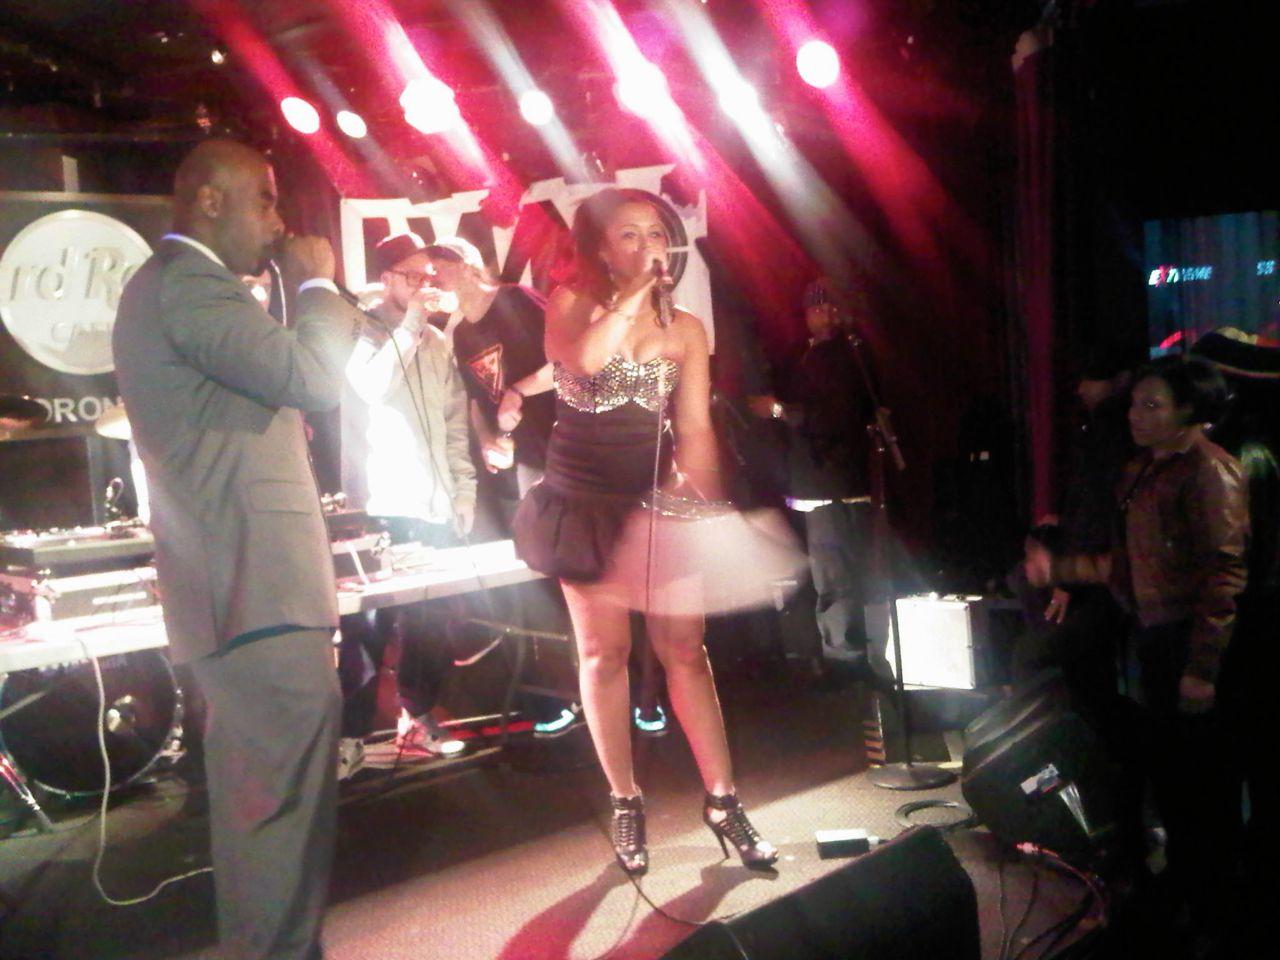 TolumiDE My Love Promo Tour Toronto Canada 2011 - 18